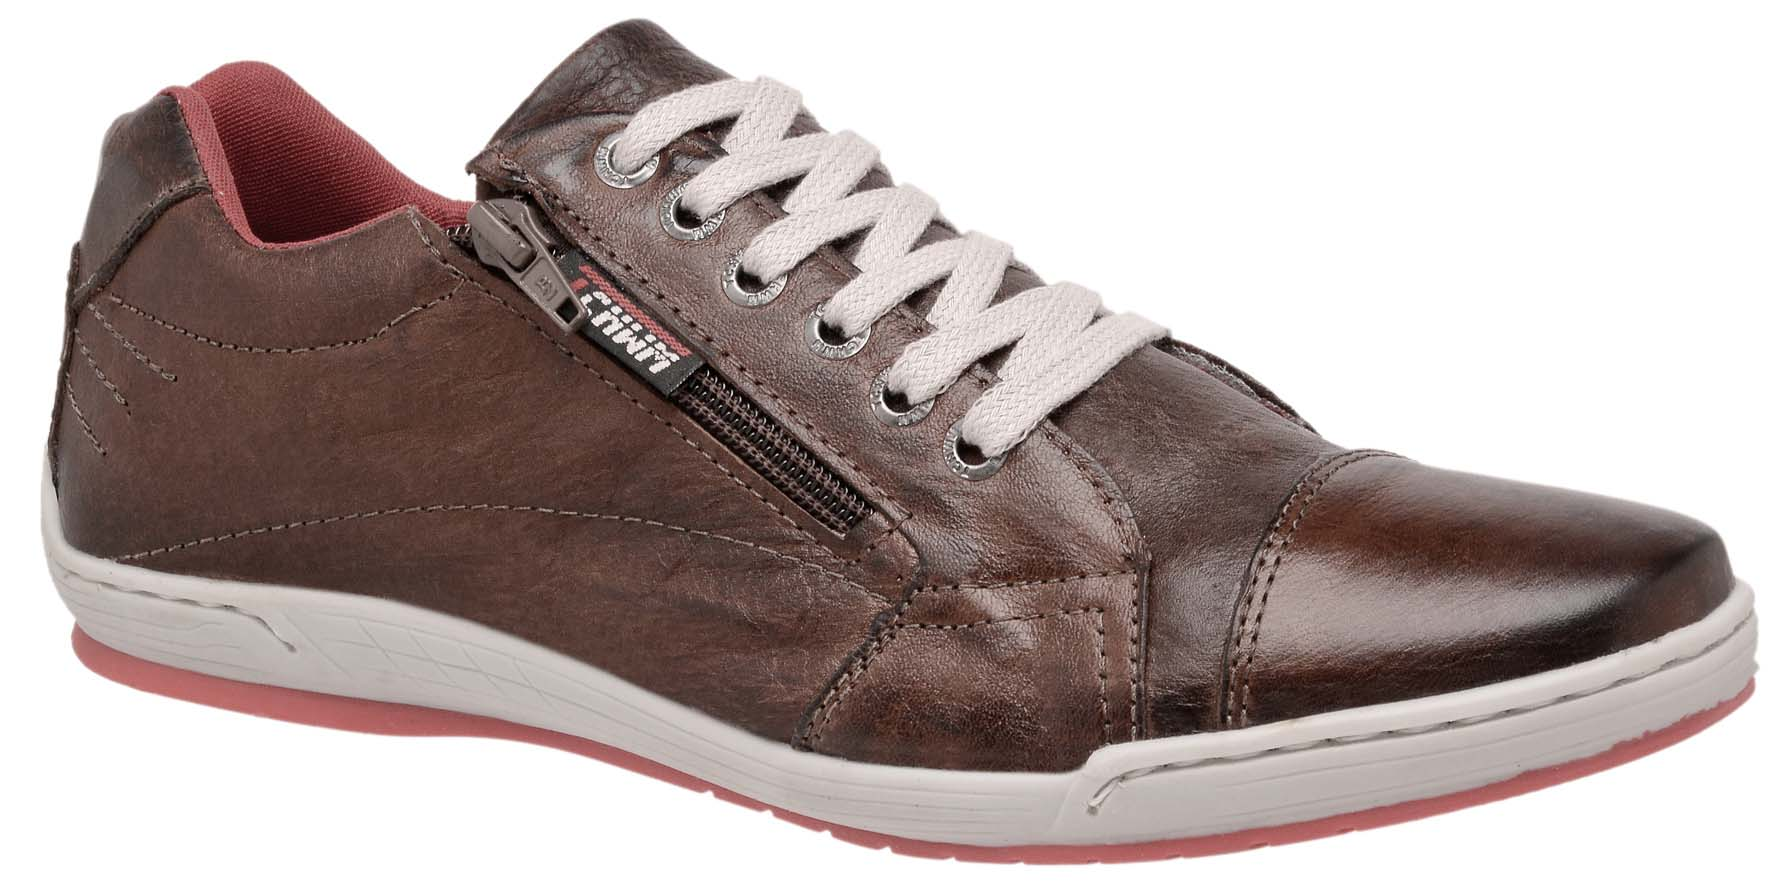 Sapatênis Zíper Stilo Tchwm Shoes Couro Fóssil - Marrom